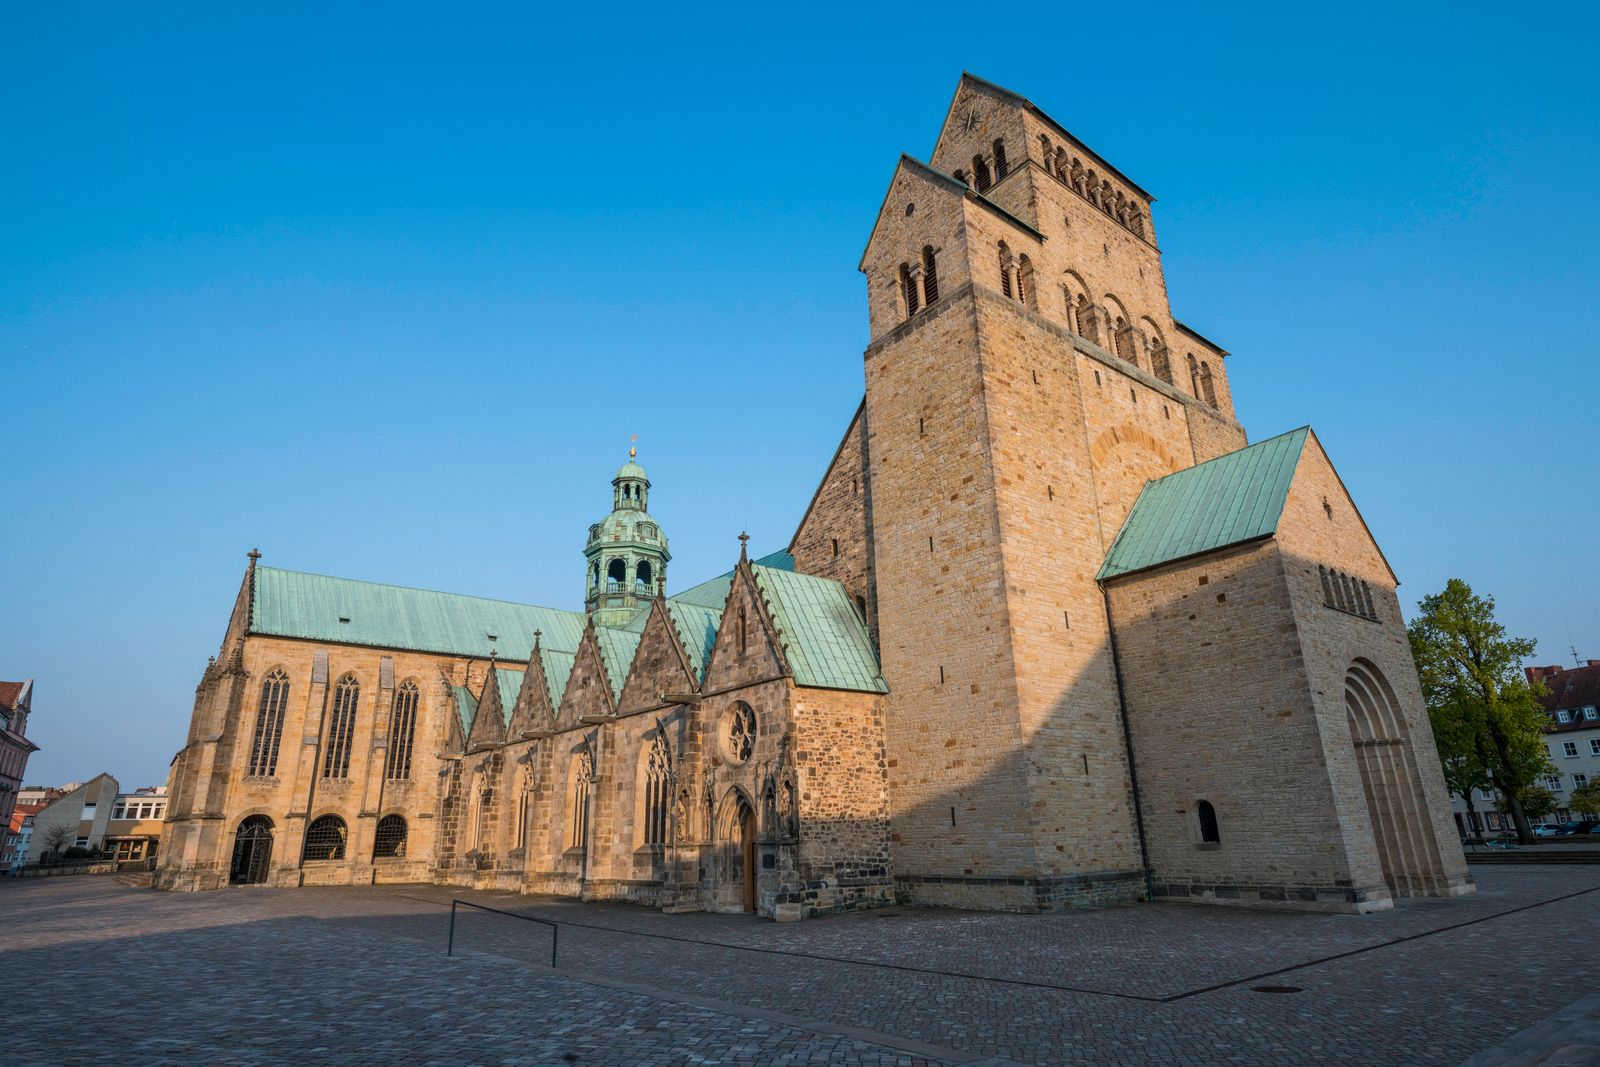 Germany, Lower Saxony, Hildesheim, Side view of Hildesheim Cathedral PUBLICATIONxINxGERxSUIxAUTxHUNxONLY RUNF03393